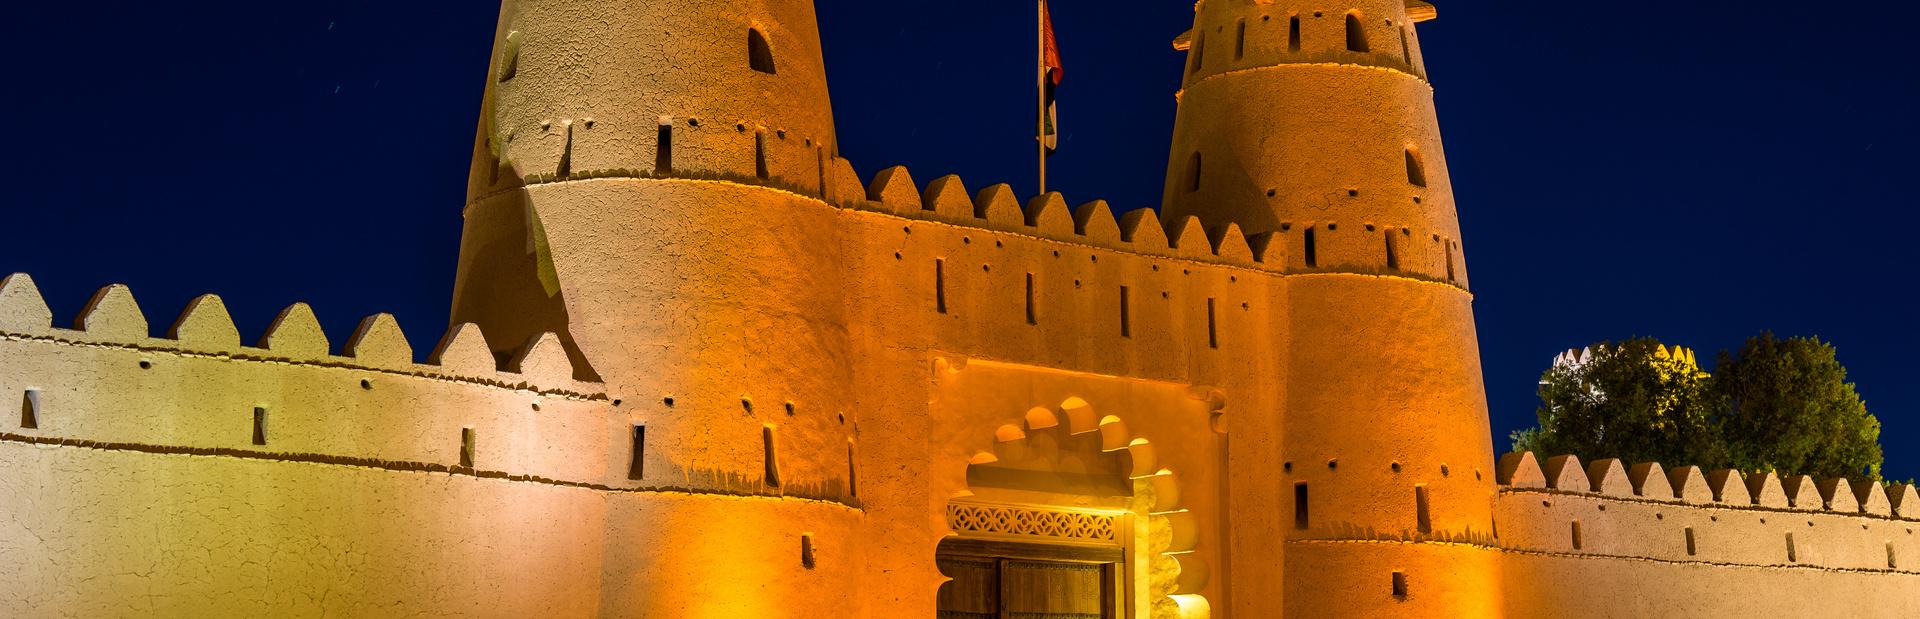 Abu Dhabi news photo